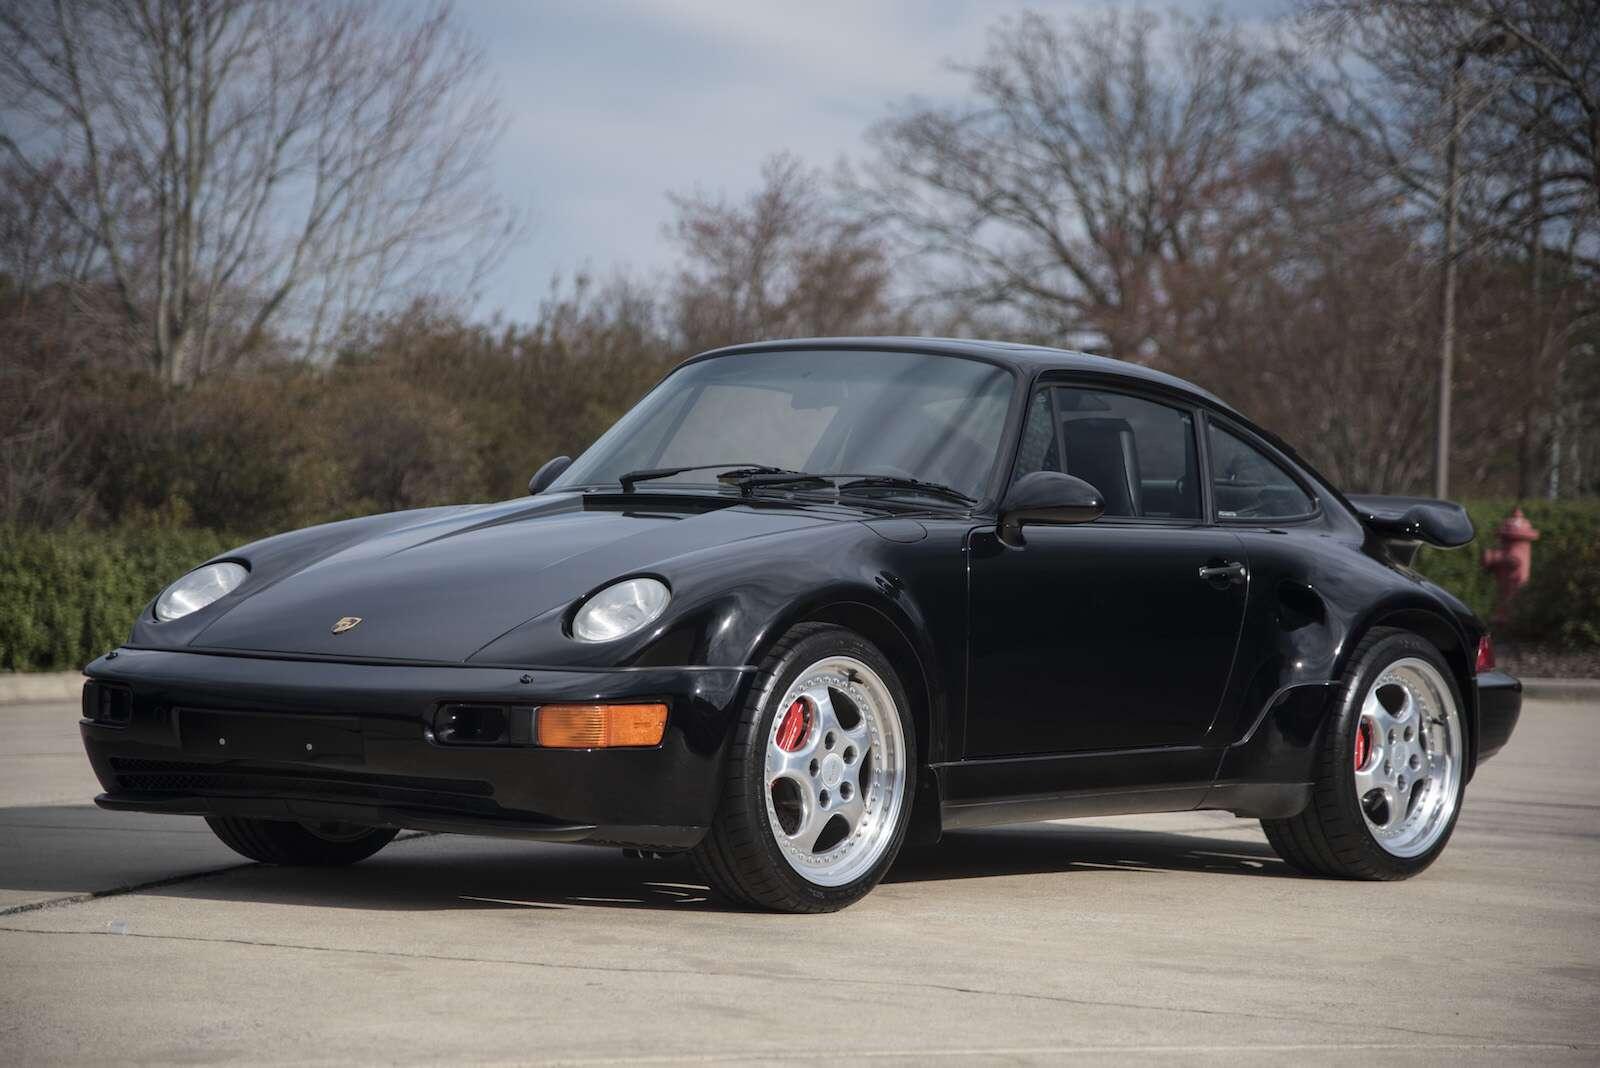 Rare Porsche 911 Turbo Flat Nose for Sale - The Drive